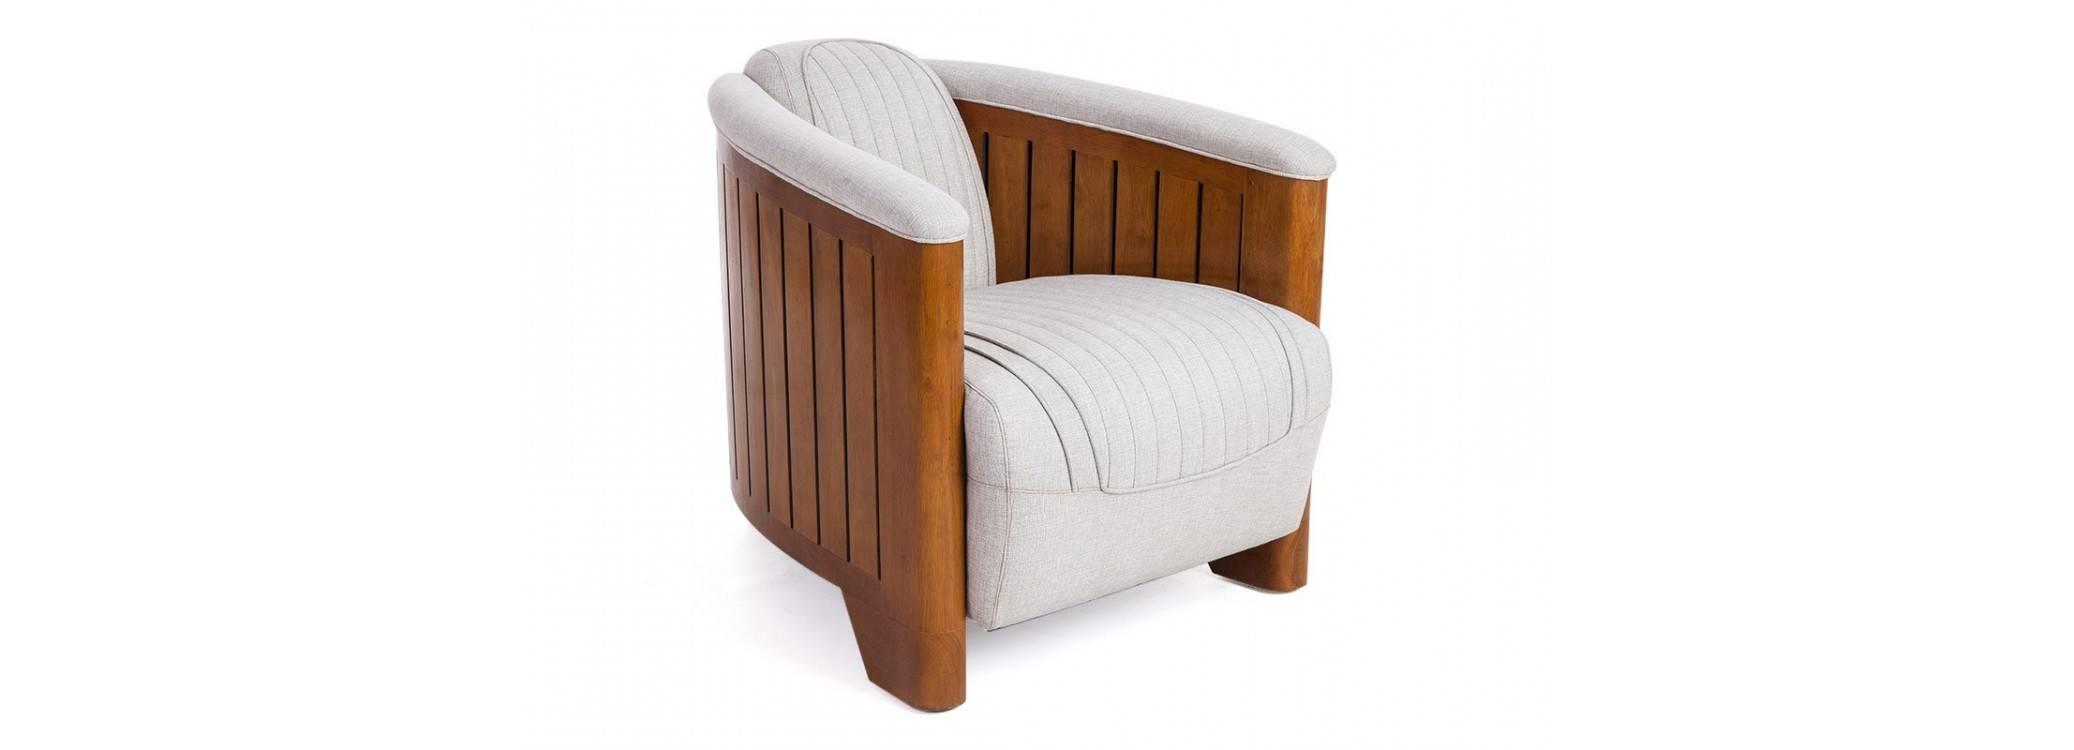 Canoë armchair - Beige fabric